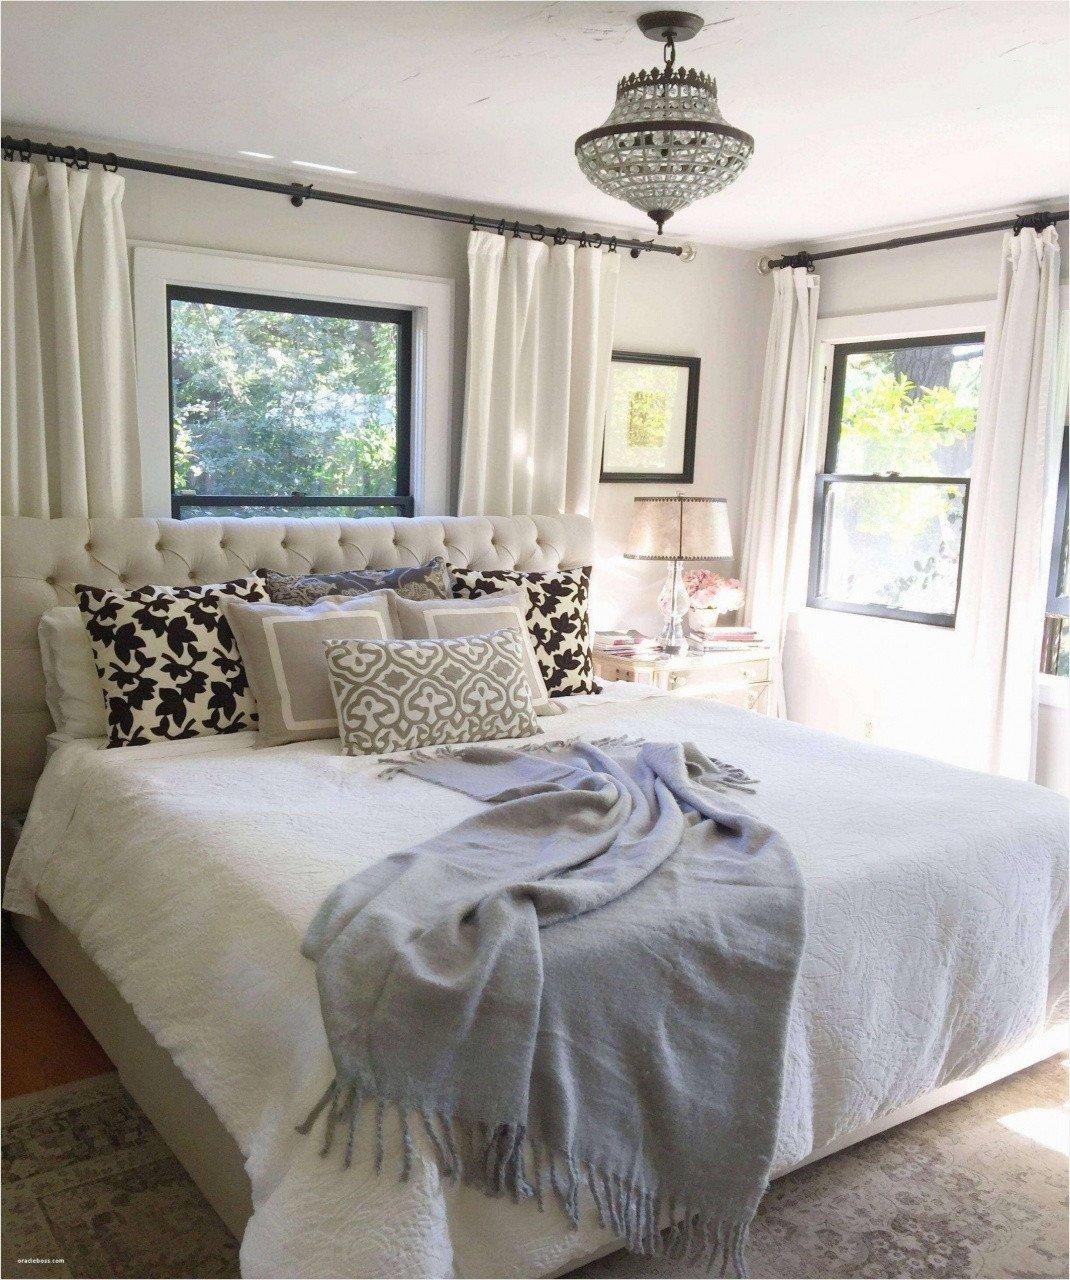 Kid Bedroom Decorating Idea Elegant Cute Small Bedroom Decorating Ideas – the New Daily Nation